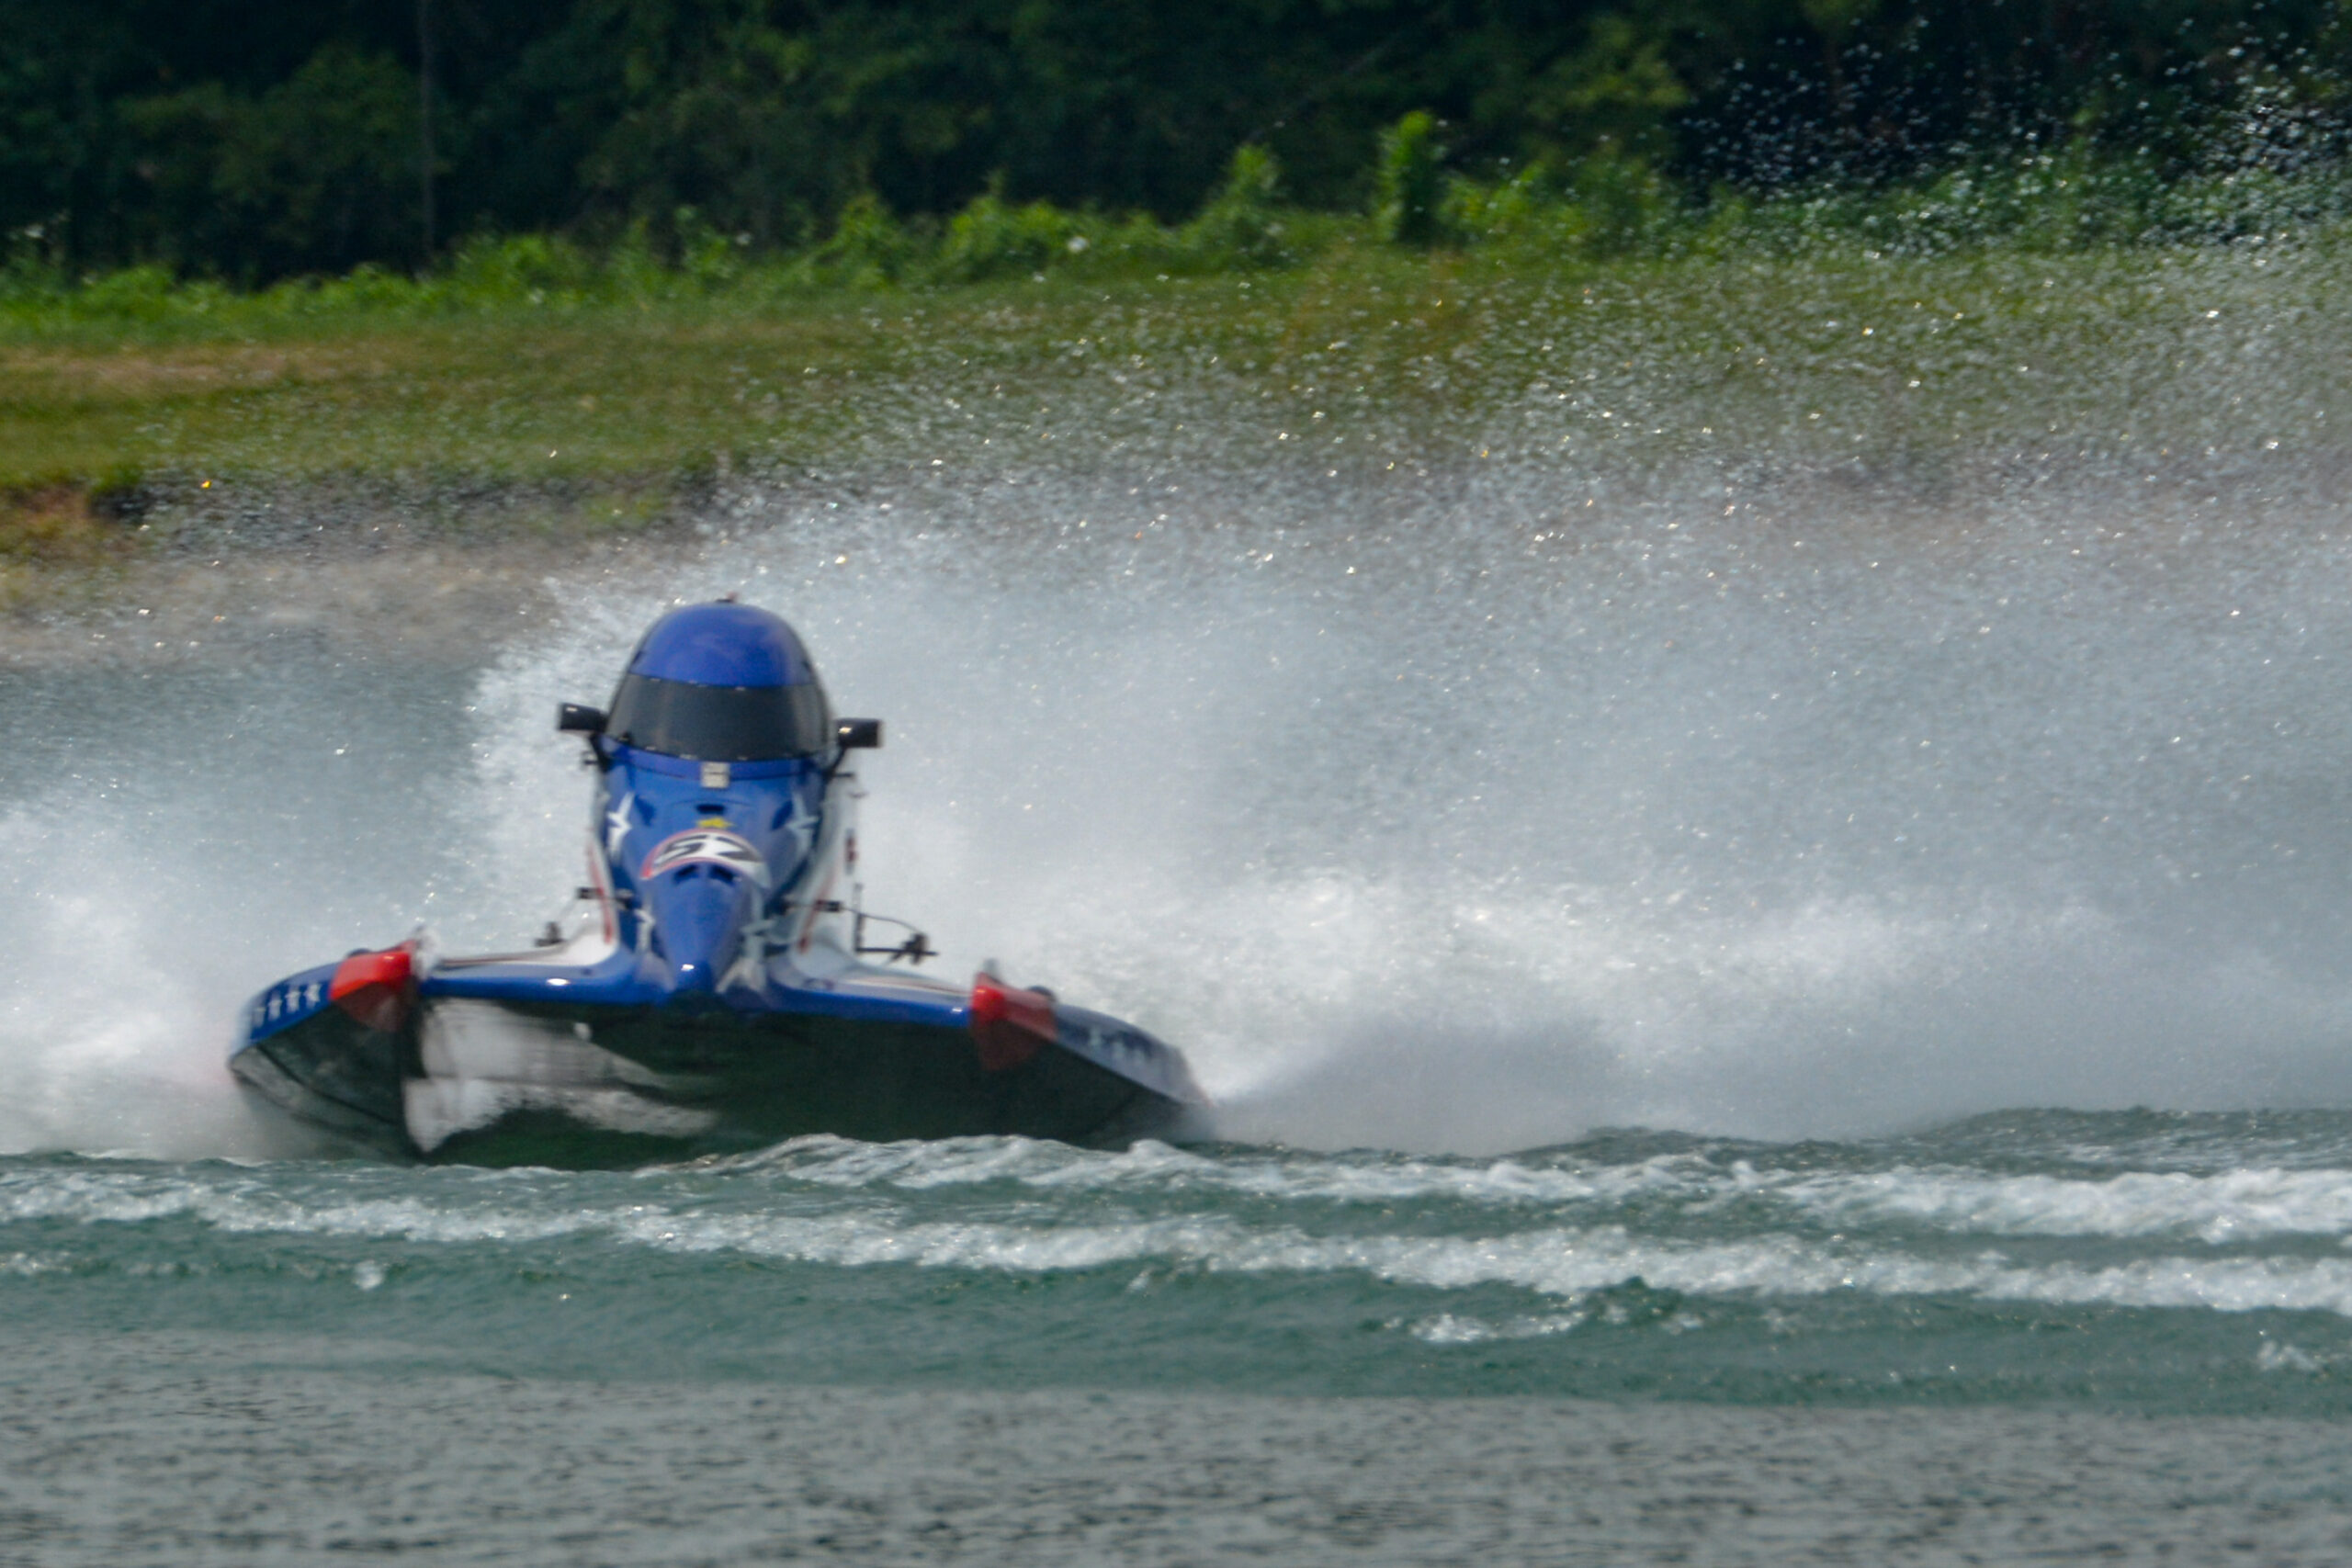 McMurray Racing Nashville Marine 2021 Springfield F1 Race-6